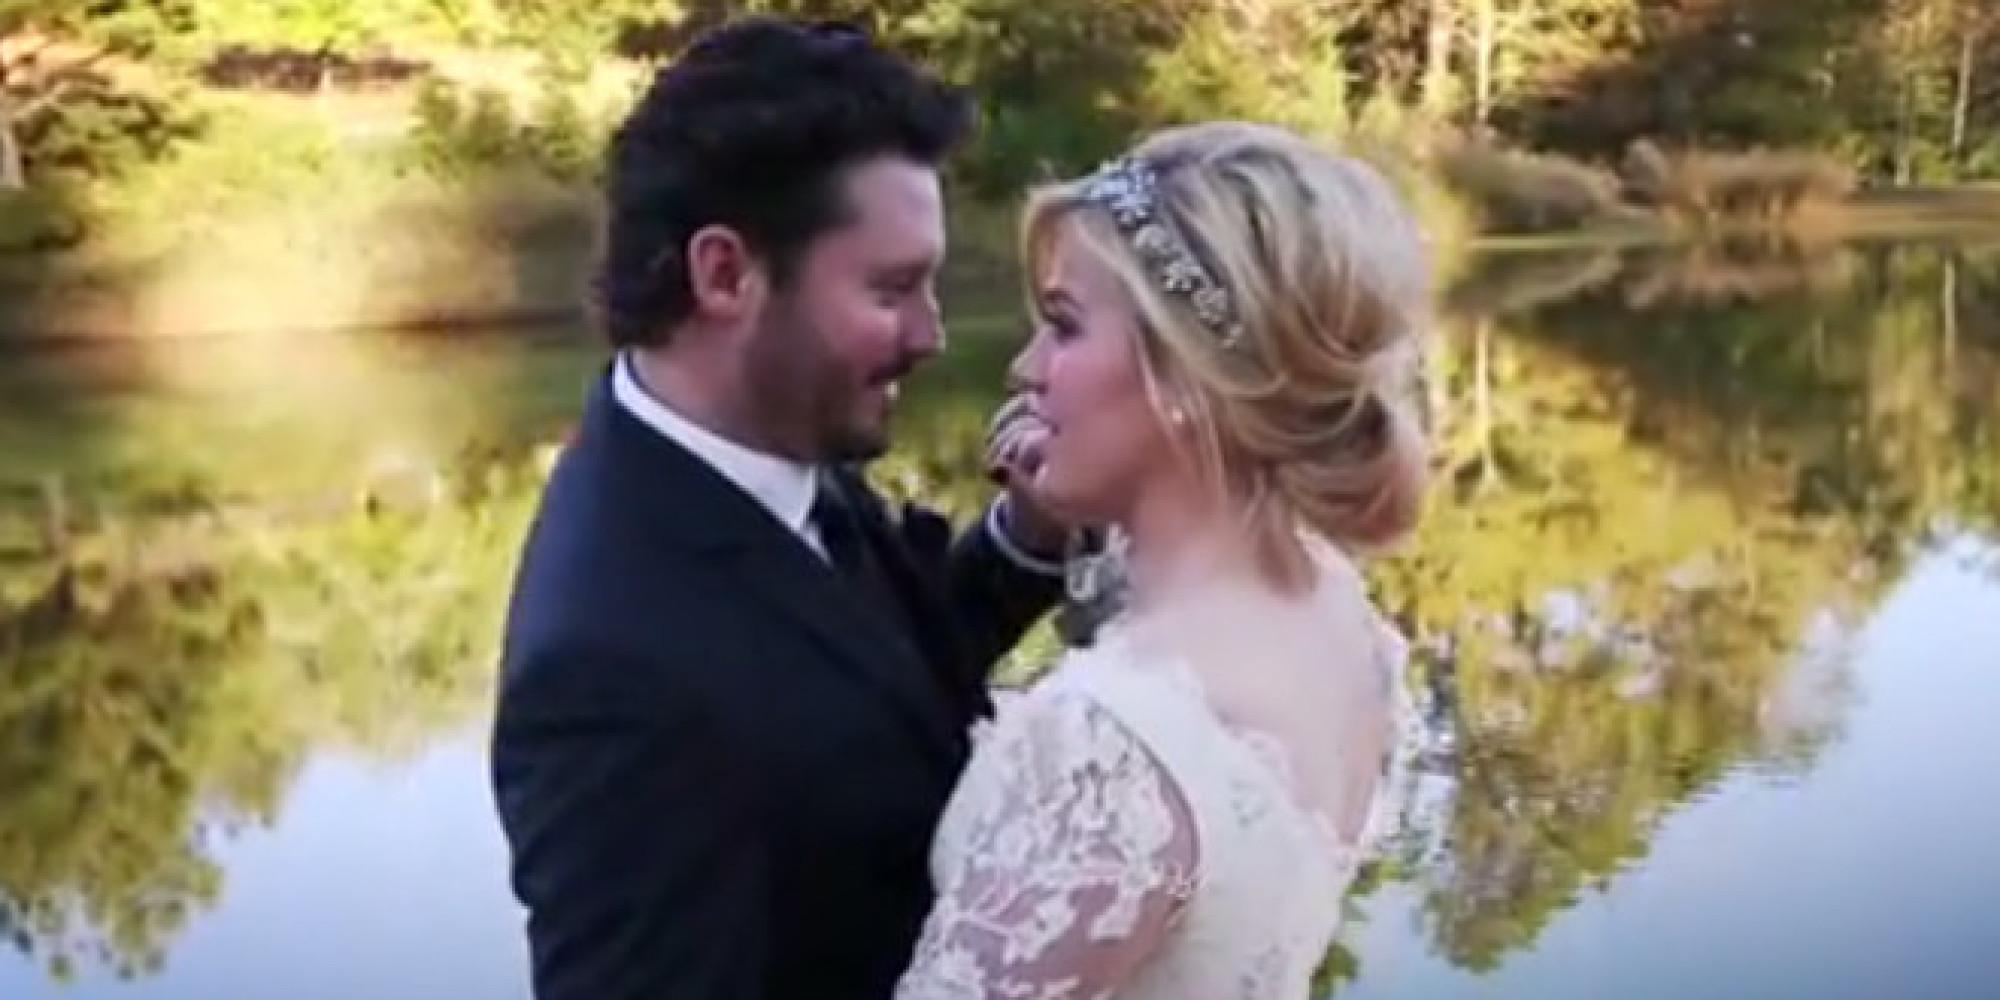 Georgia wife plays while husband films - 5 3